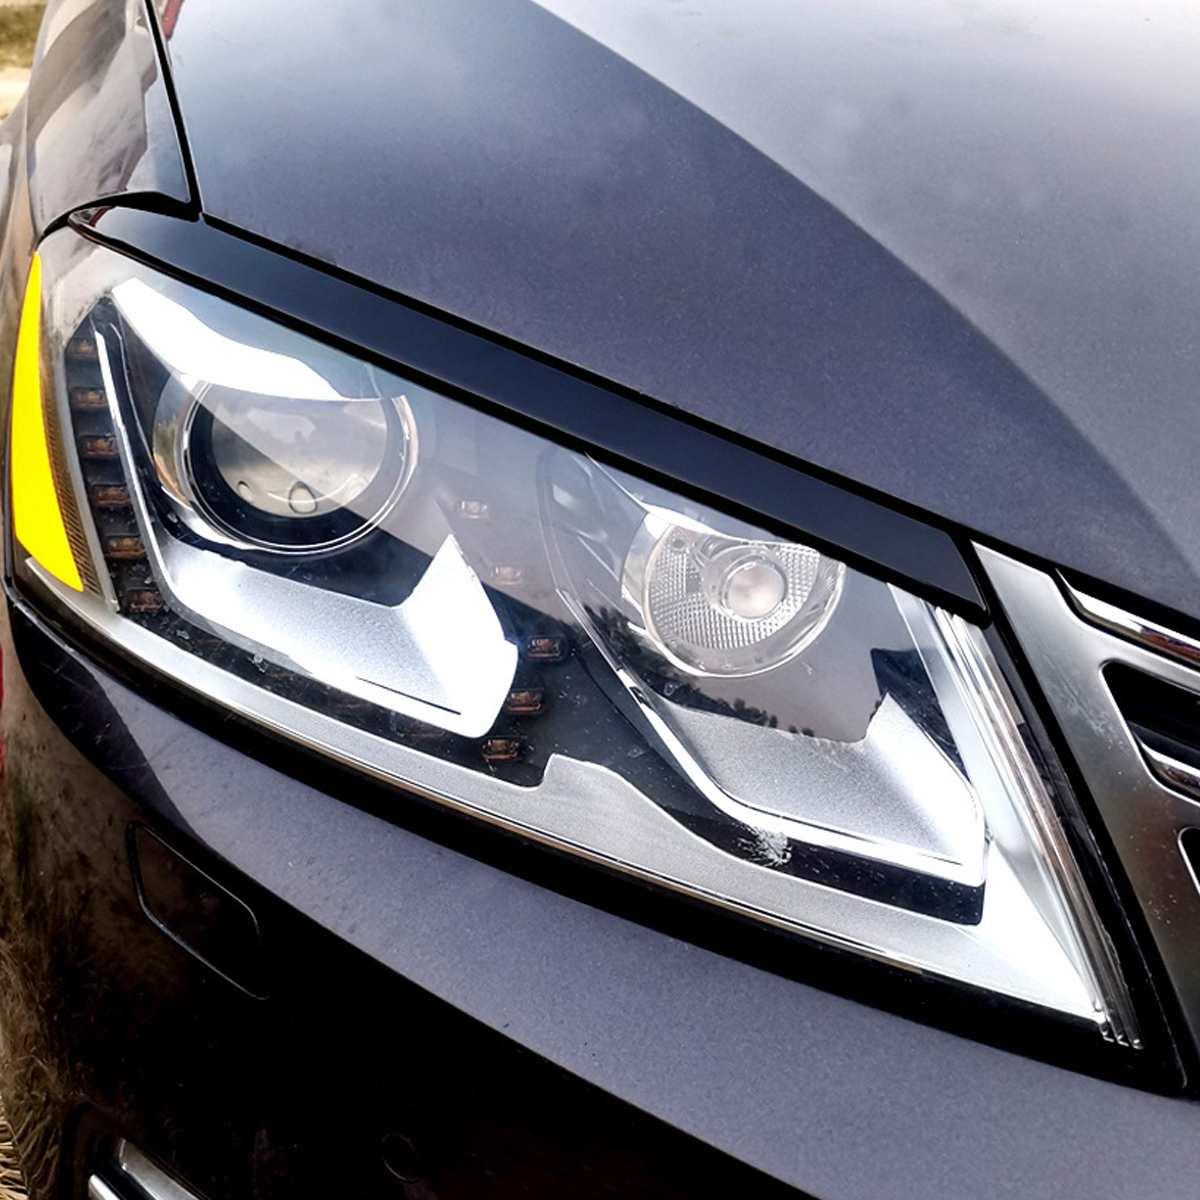 2Pcs CarbonLook Resin Headlight Eyelid Eyebrows Cover car Sticker Trim For VW for Passat B7 2010 2011 2012 2013 2014 Car Styling